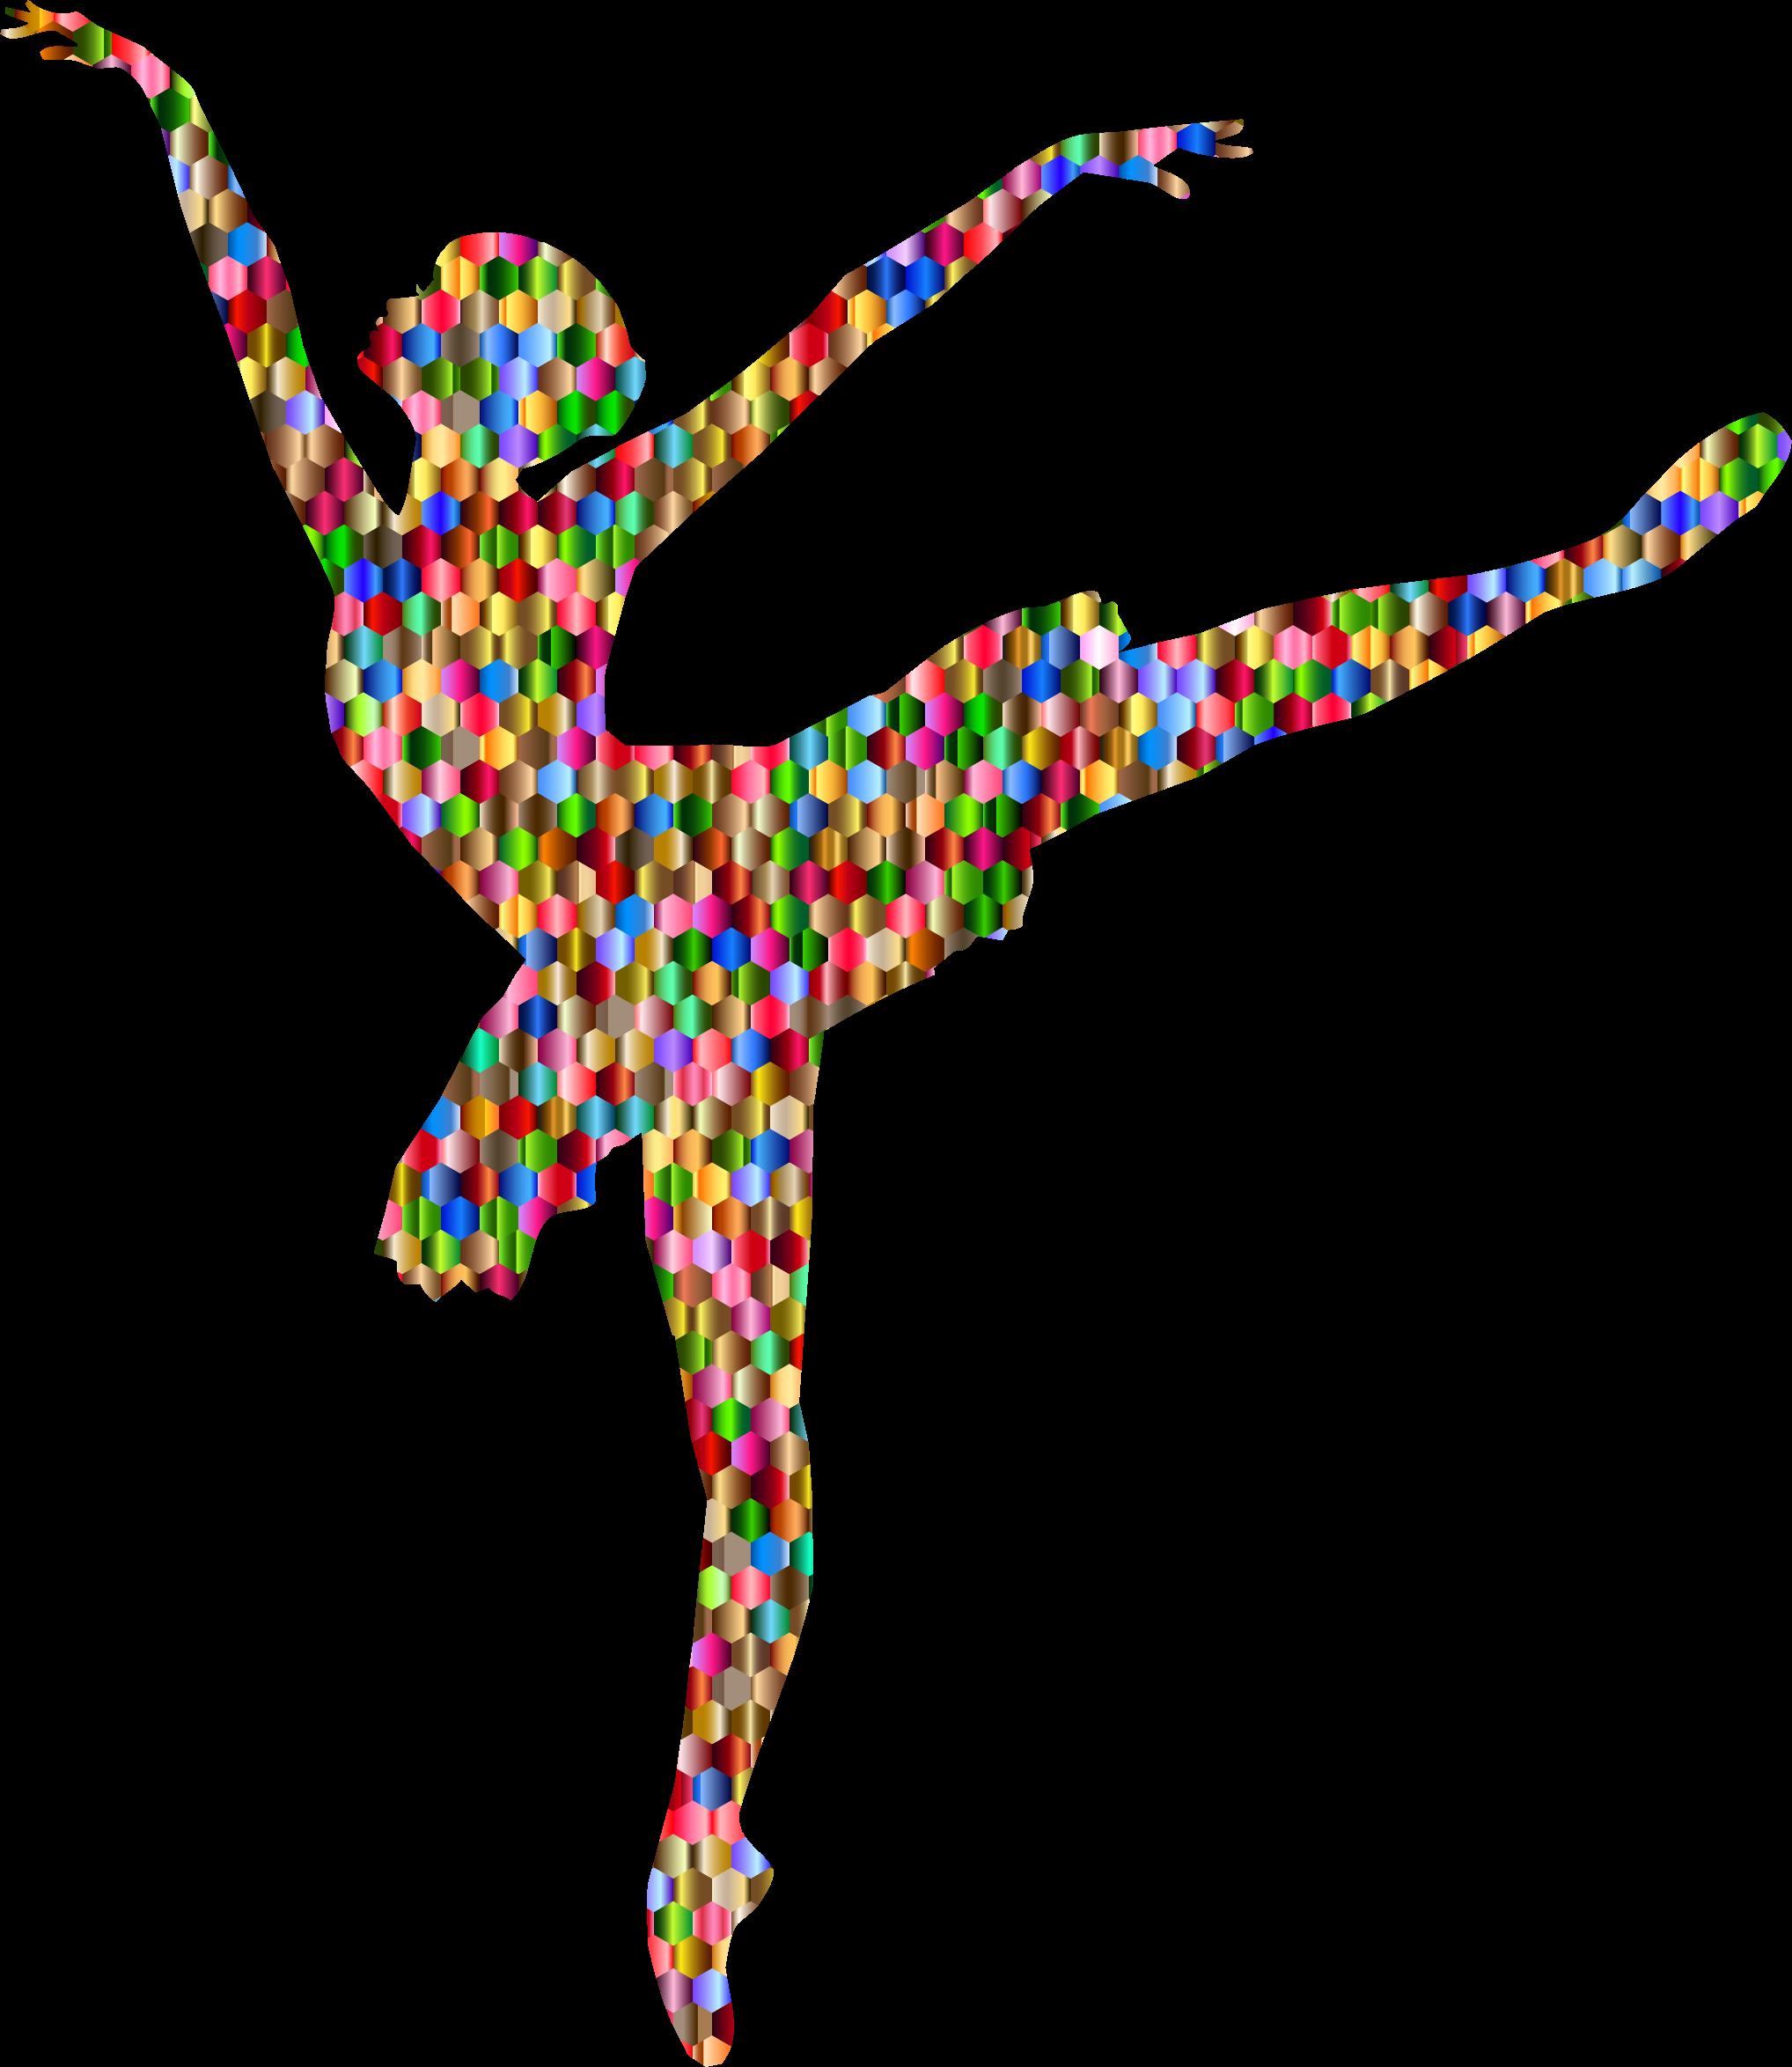 Gecko clipart rainbow. Chromatic hexagonal graceful ballerina